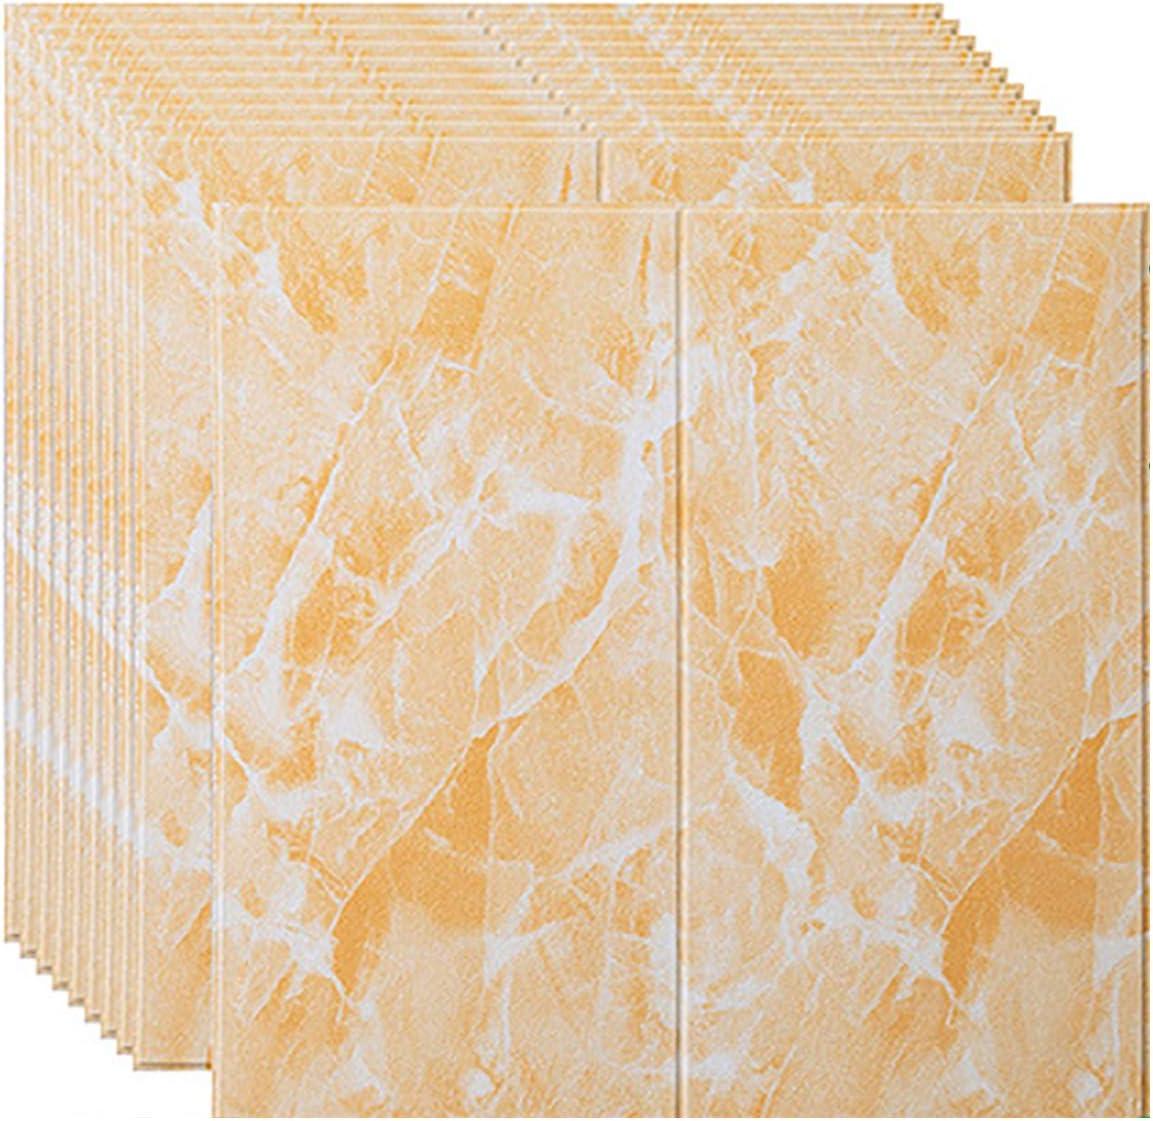 XCYYBB 3D Sale Special Price Brick WallpaperSelf Adhesive PE [Alternative dealer] Soundproof Foam Bri